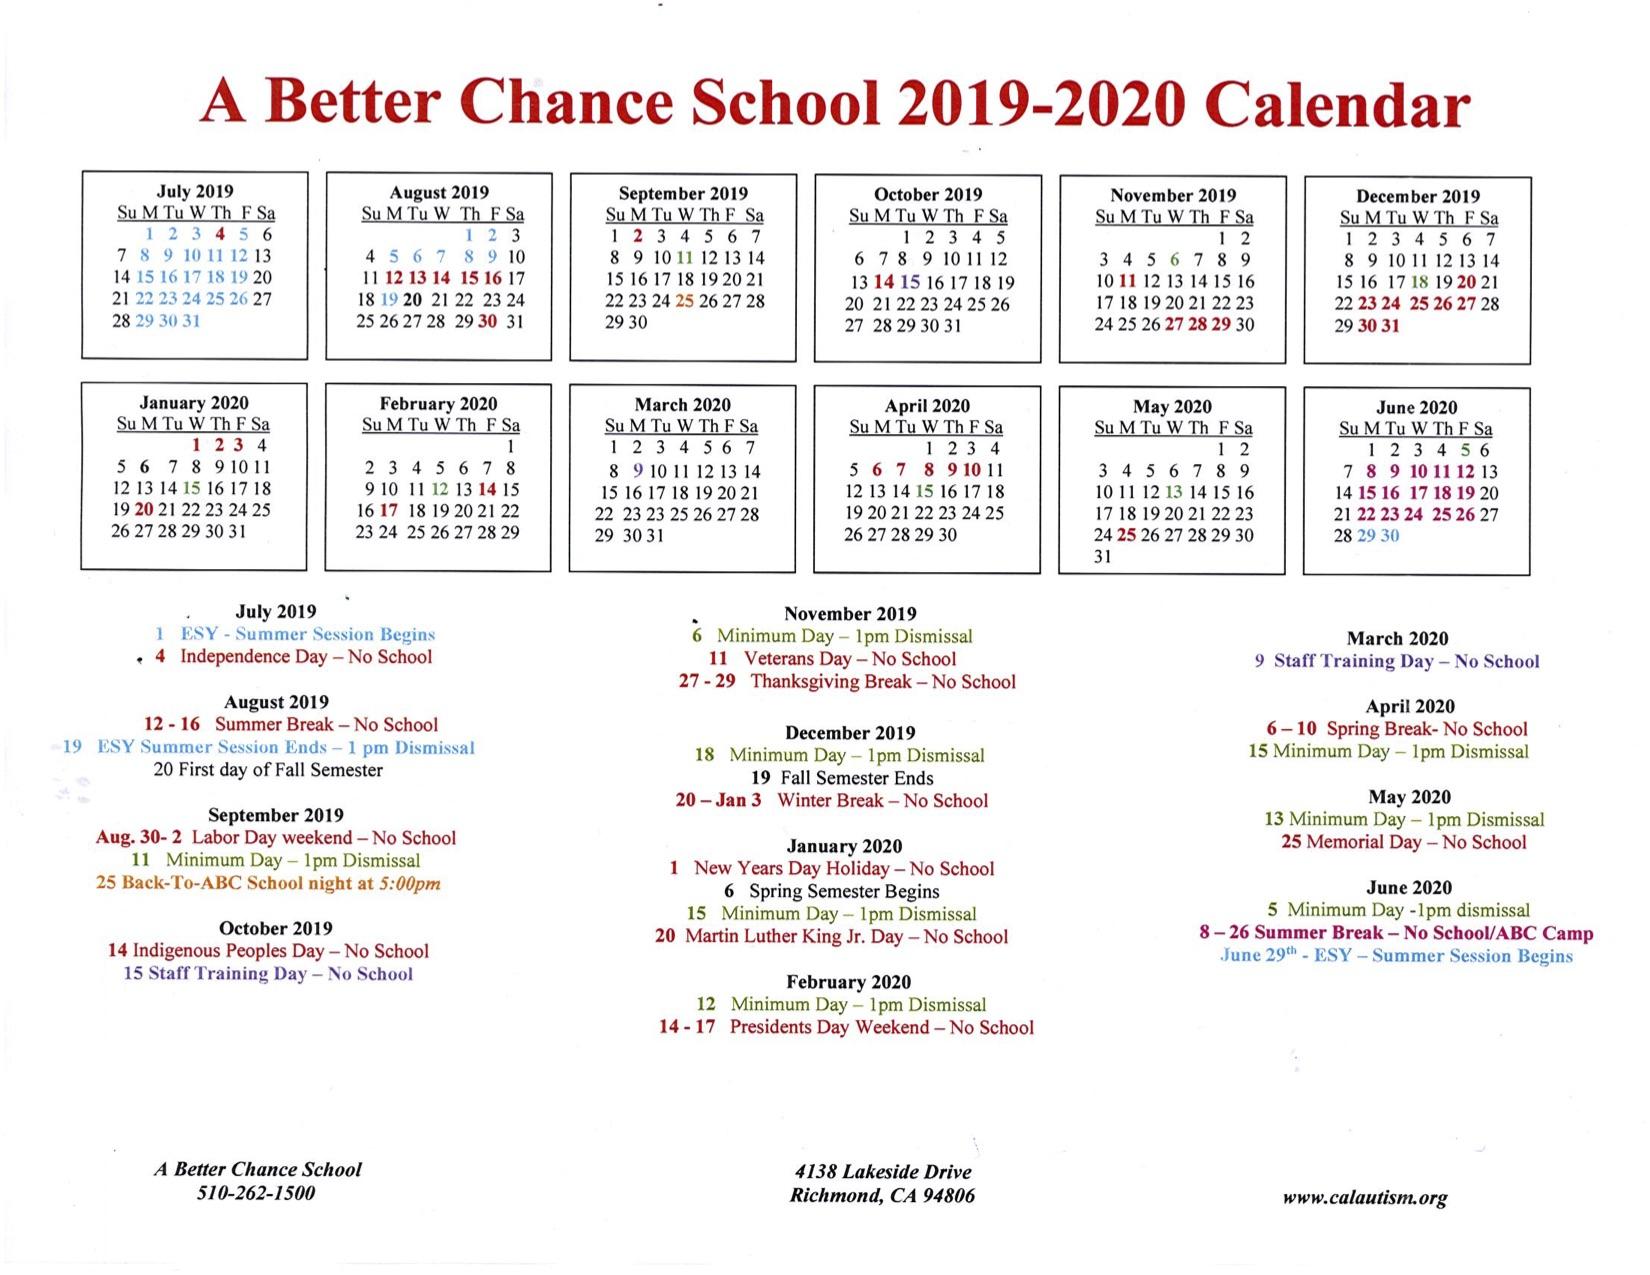 A Better Chance School 2019-2020 Calendar « California Autism Foundation within U Of M 2019 2020 Calendar